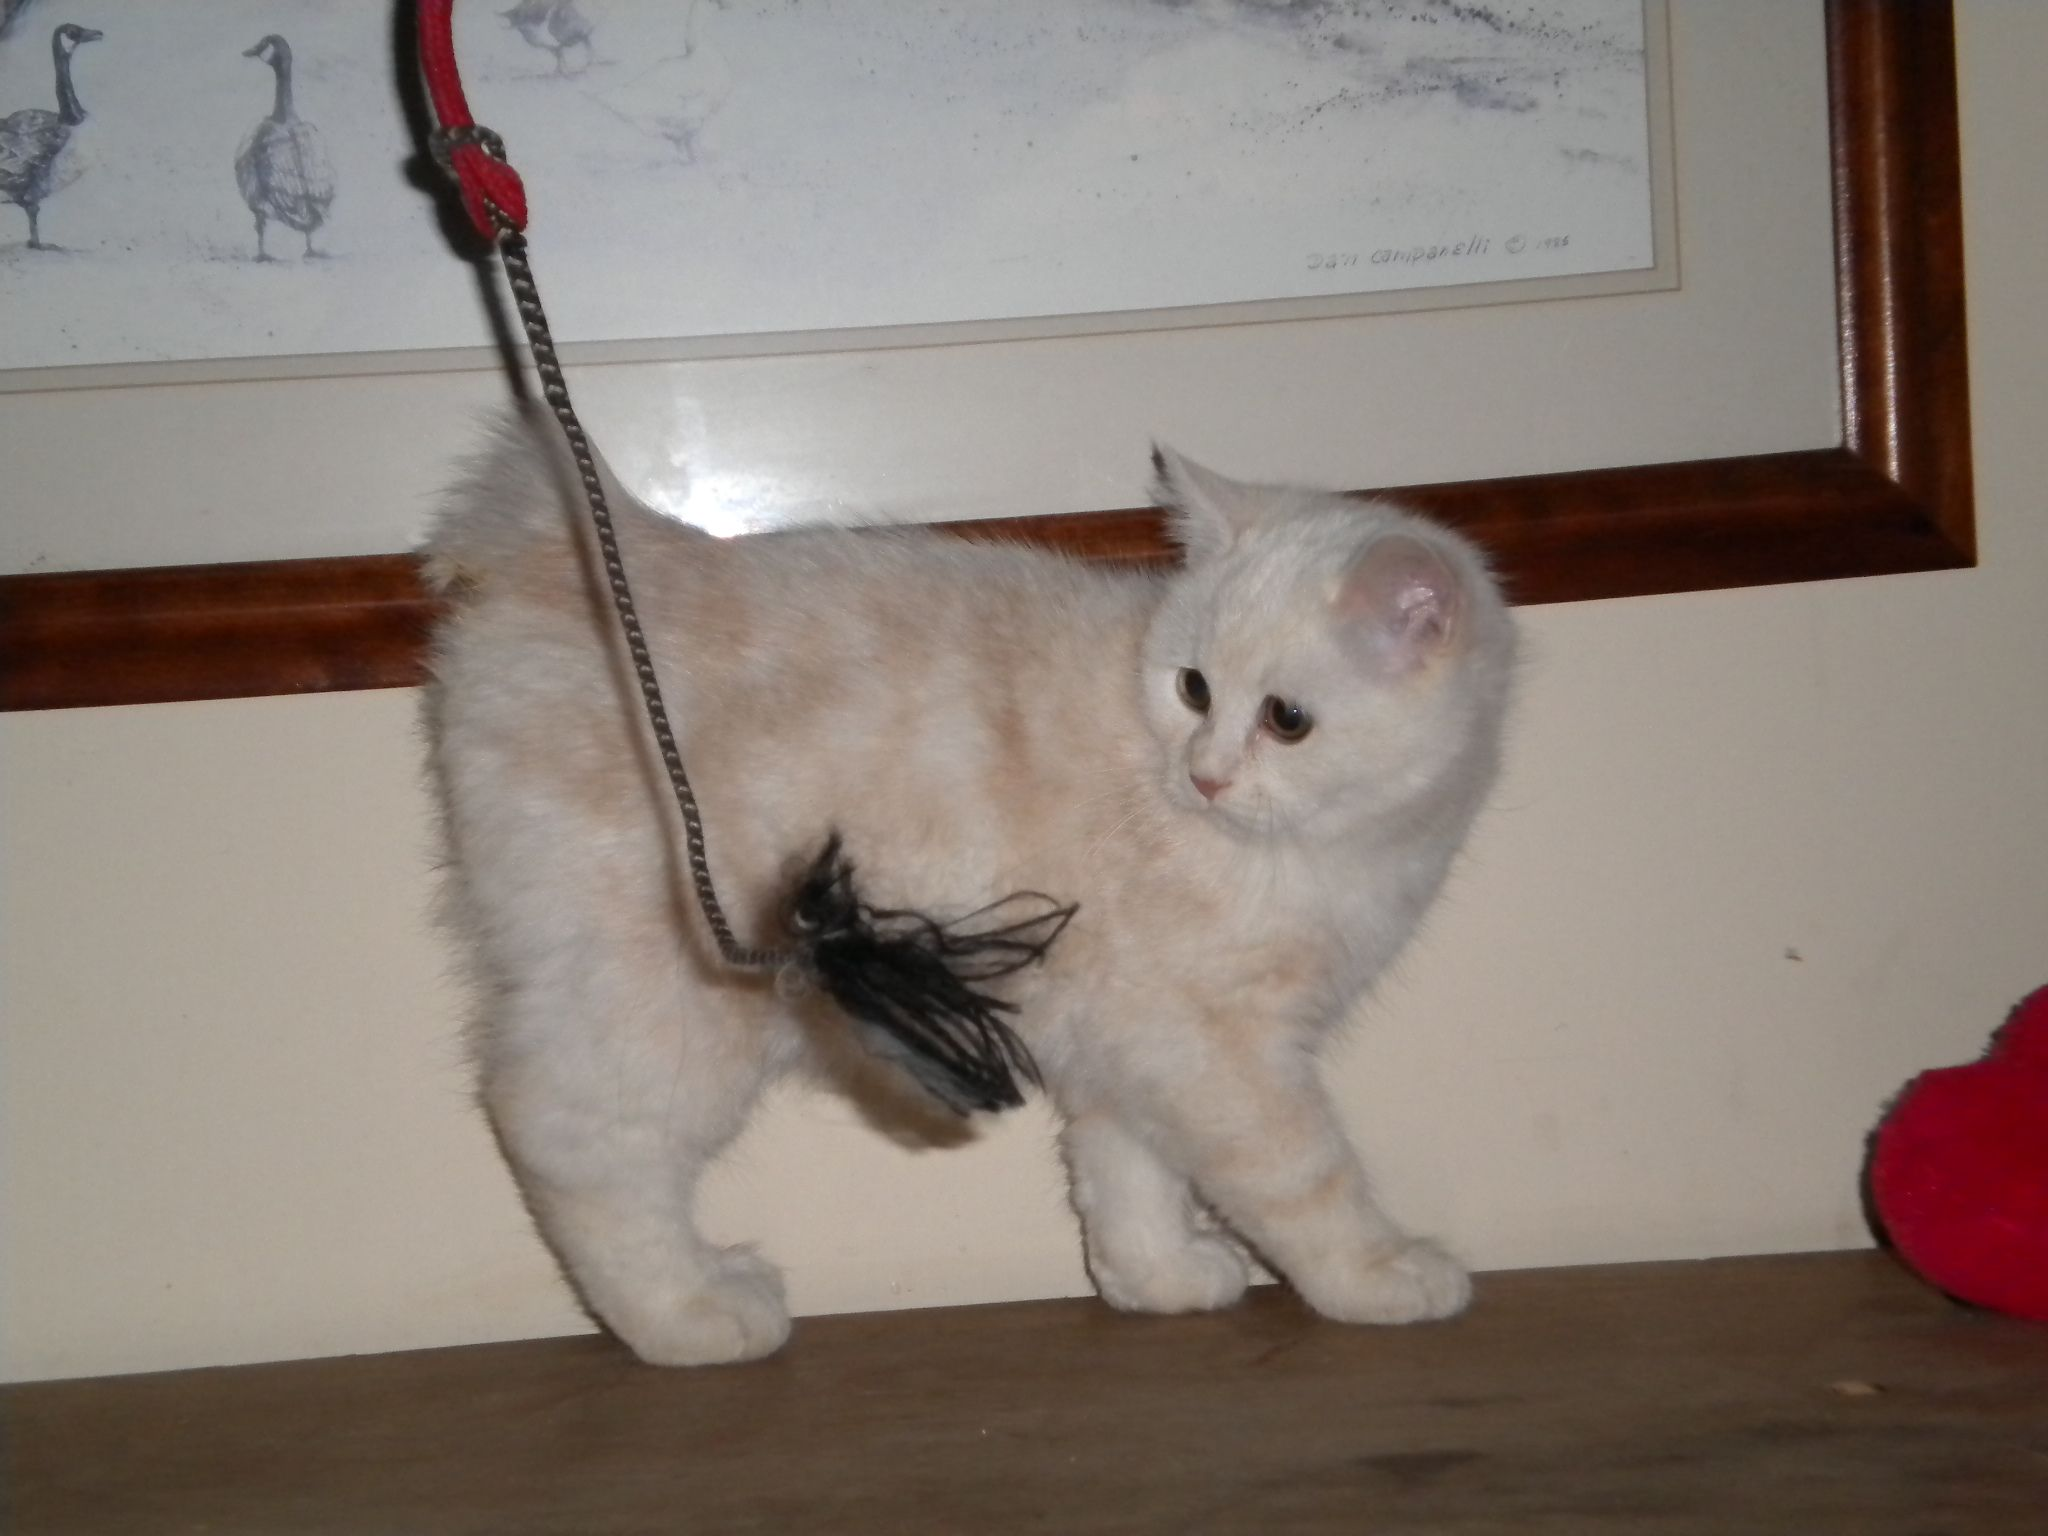 Manx Cats Manx Kittens Manxstation Com Manx Kittens Manx Cat I Love Cats